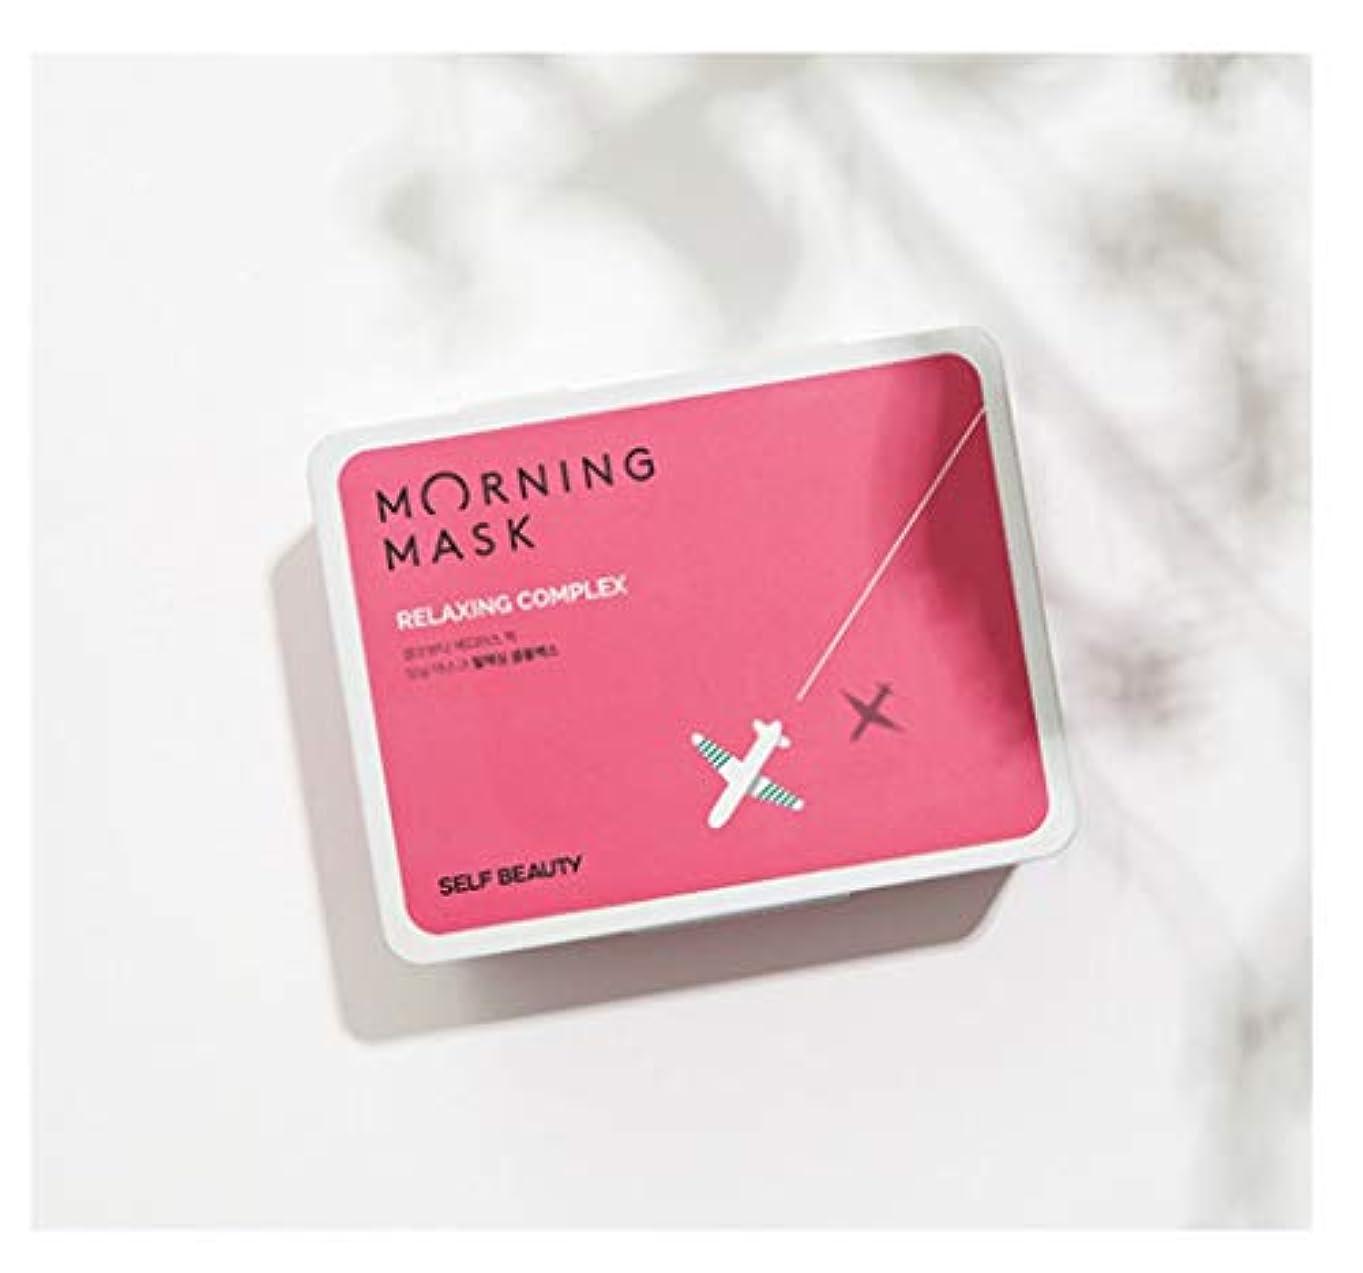 Self Beauty Morning Mask Relaxing Complex 1Box/30Sheetメイクアップの前にモーニングマスク、疲れた肌のための鎮静ケア(海外直送)